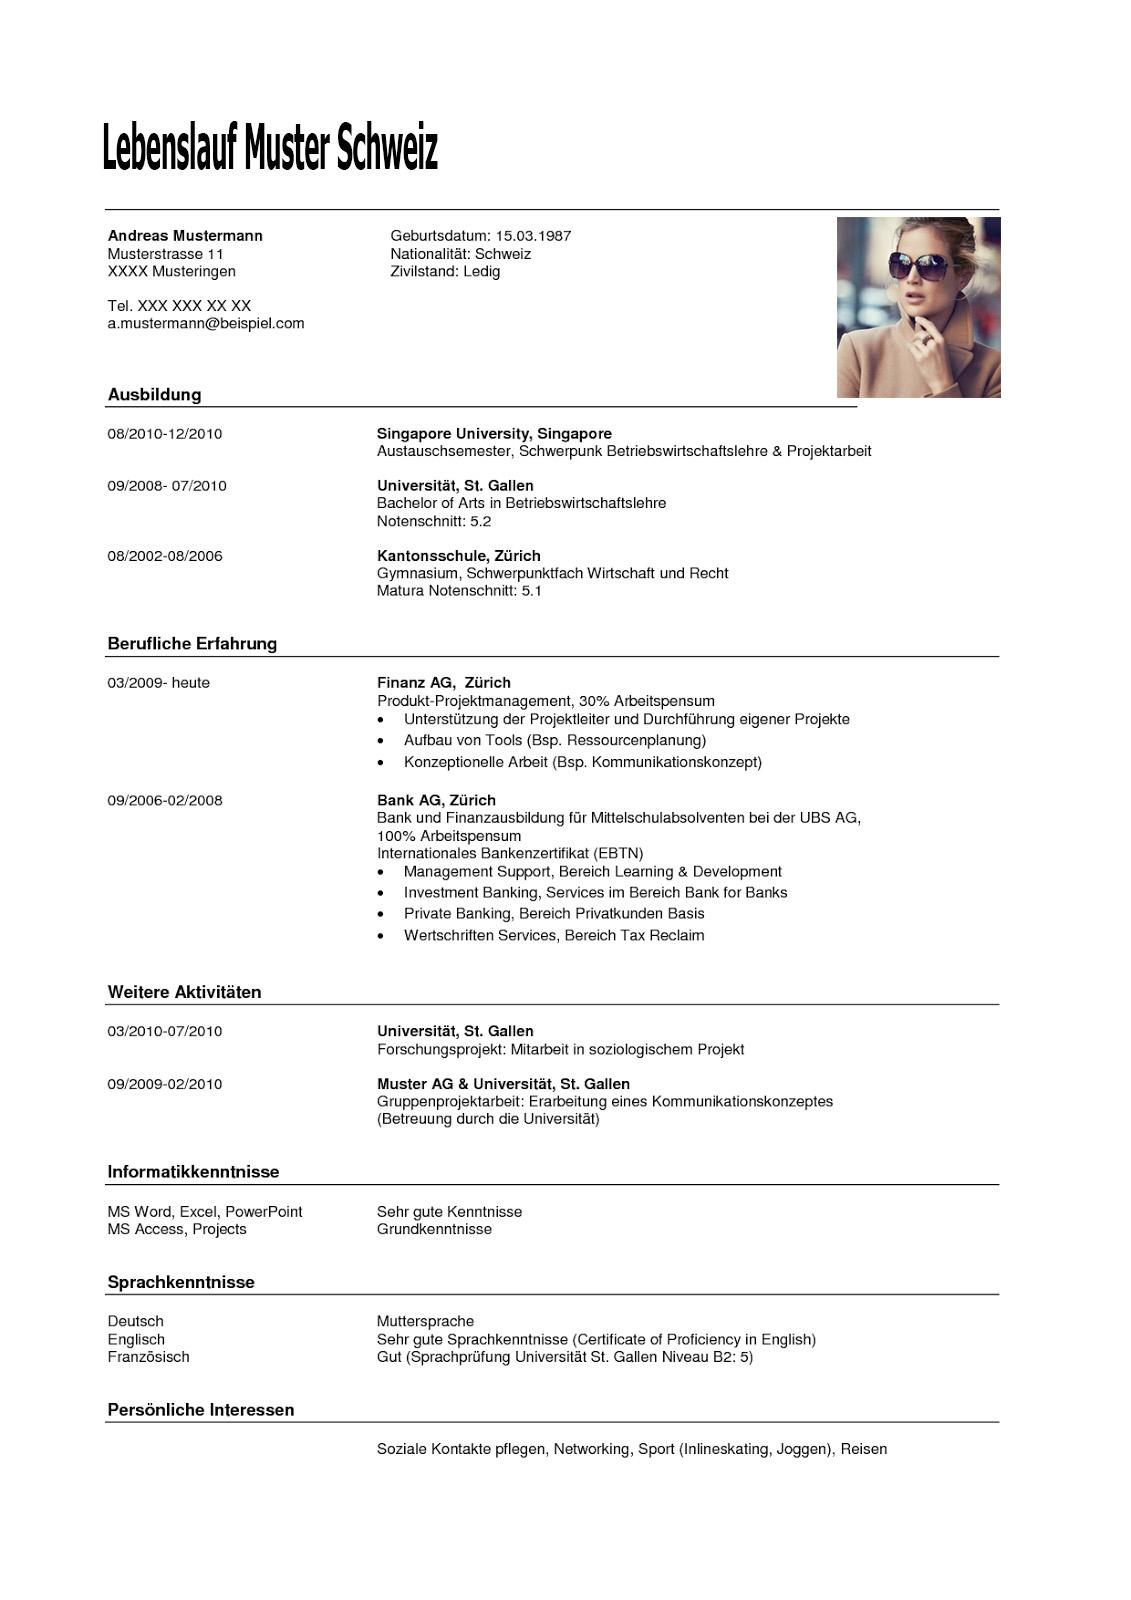 Lebenslauf Muster Schweiz Dokument Blogs